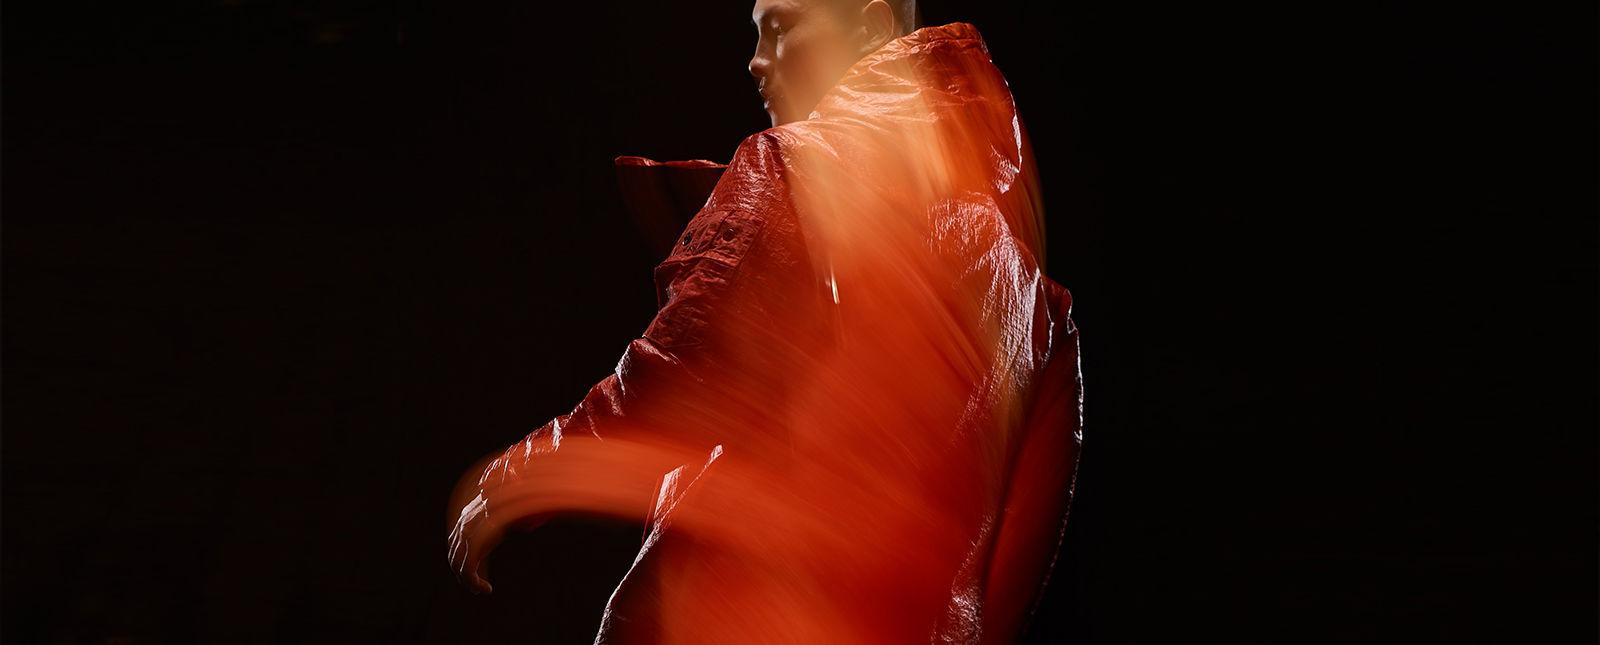 Blurred shot of model wearing red, hooded jacket.